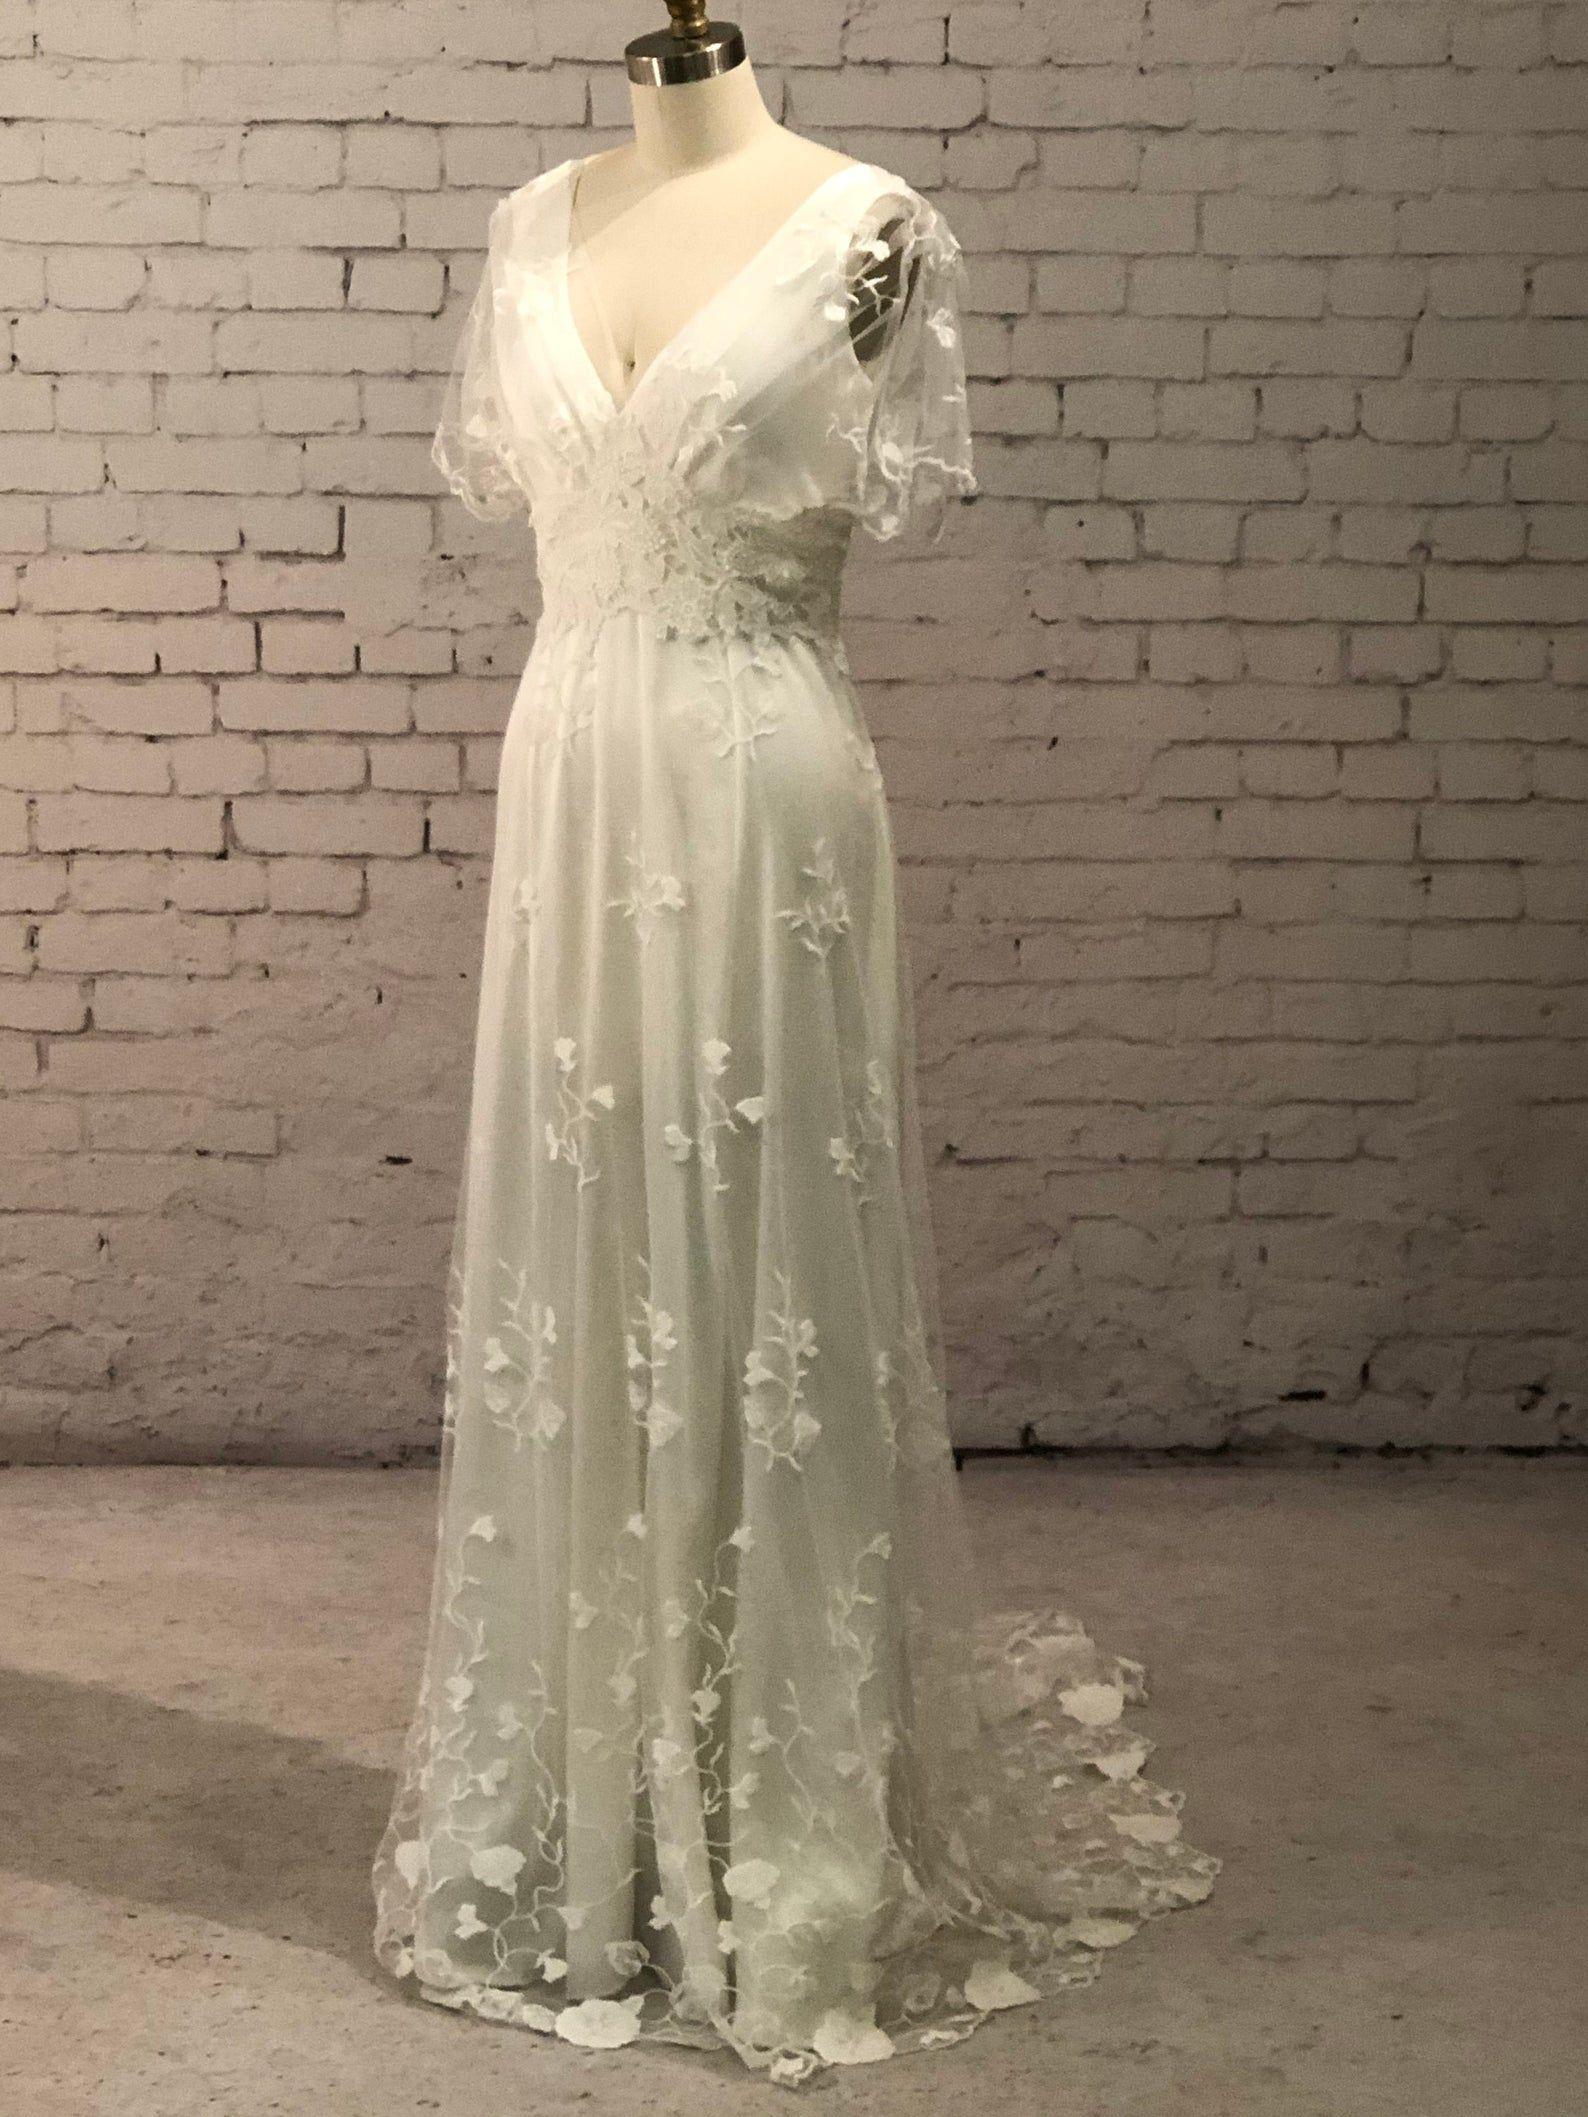 Casual Wedding Dress Simple Wedding Dress Backyard Wedding Dress Rustic Wedding Dress Vintage Wedding Dress Wedding Dress With Sleeves In 2021 Casual Wedding Dress Backyard Wedding Dresses Simple Wedding Dress Casual [ 2556 x 1588 Pixel ]